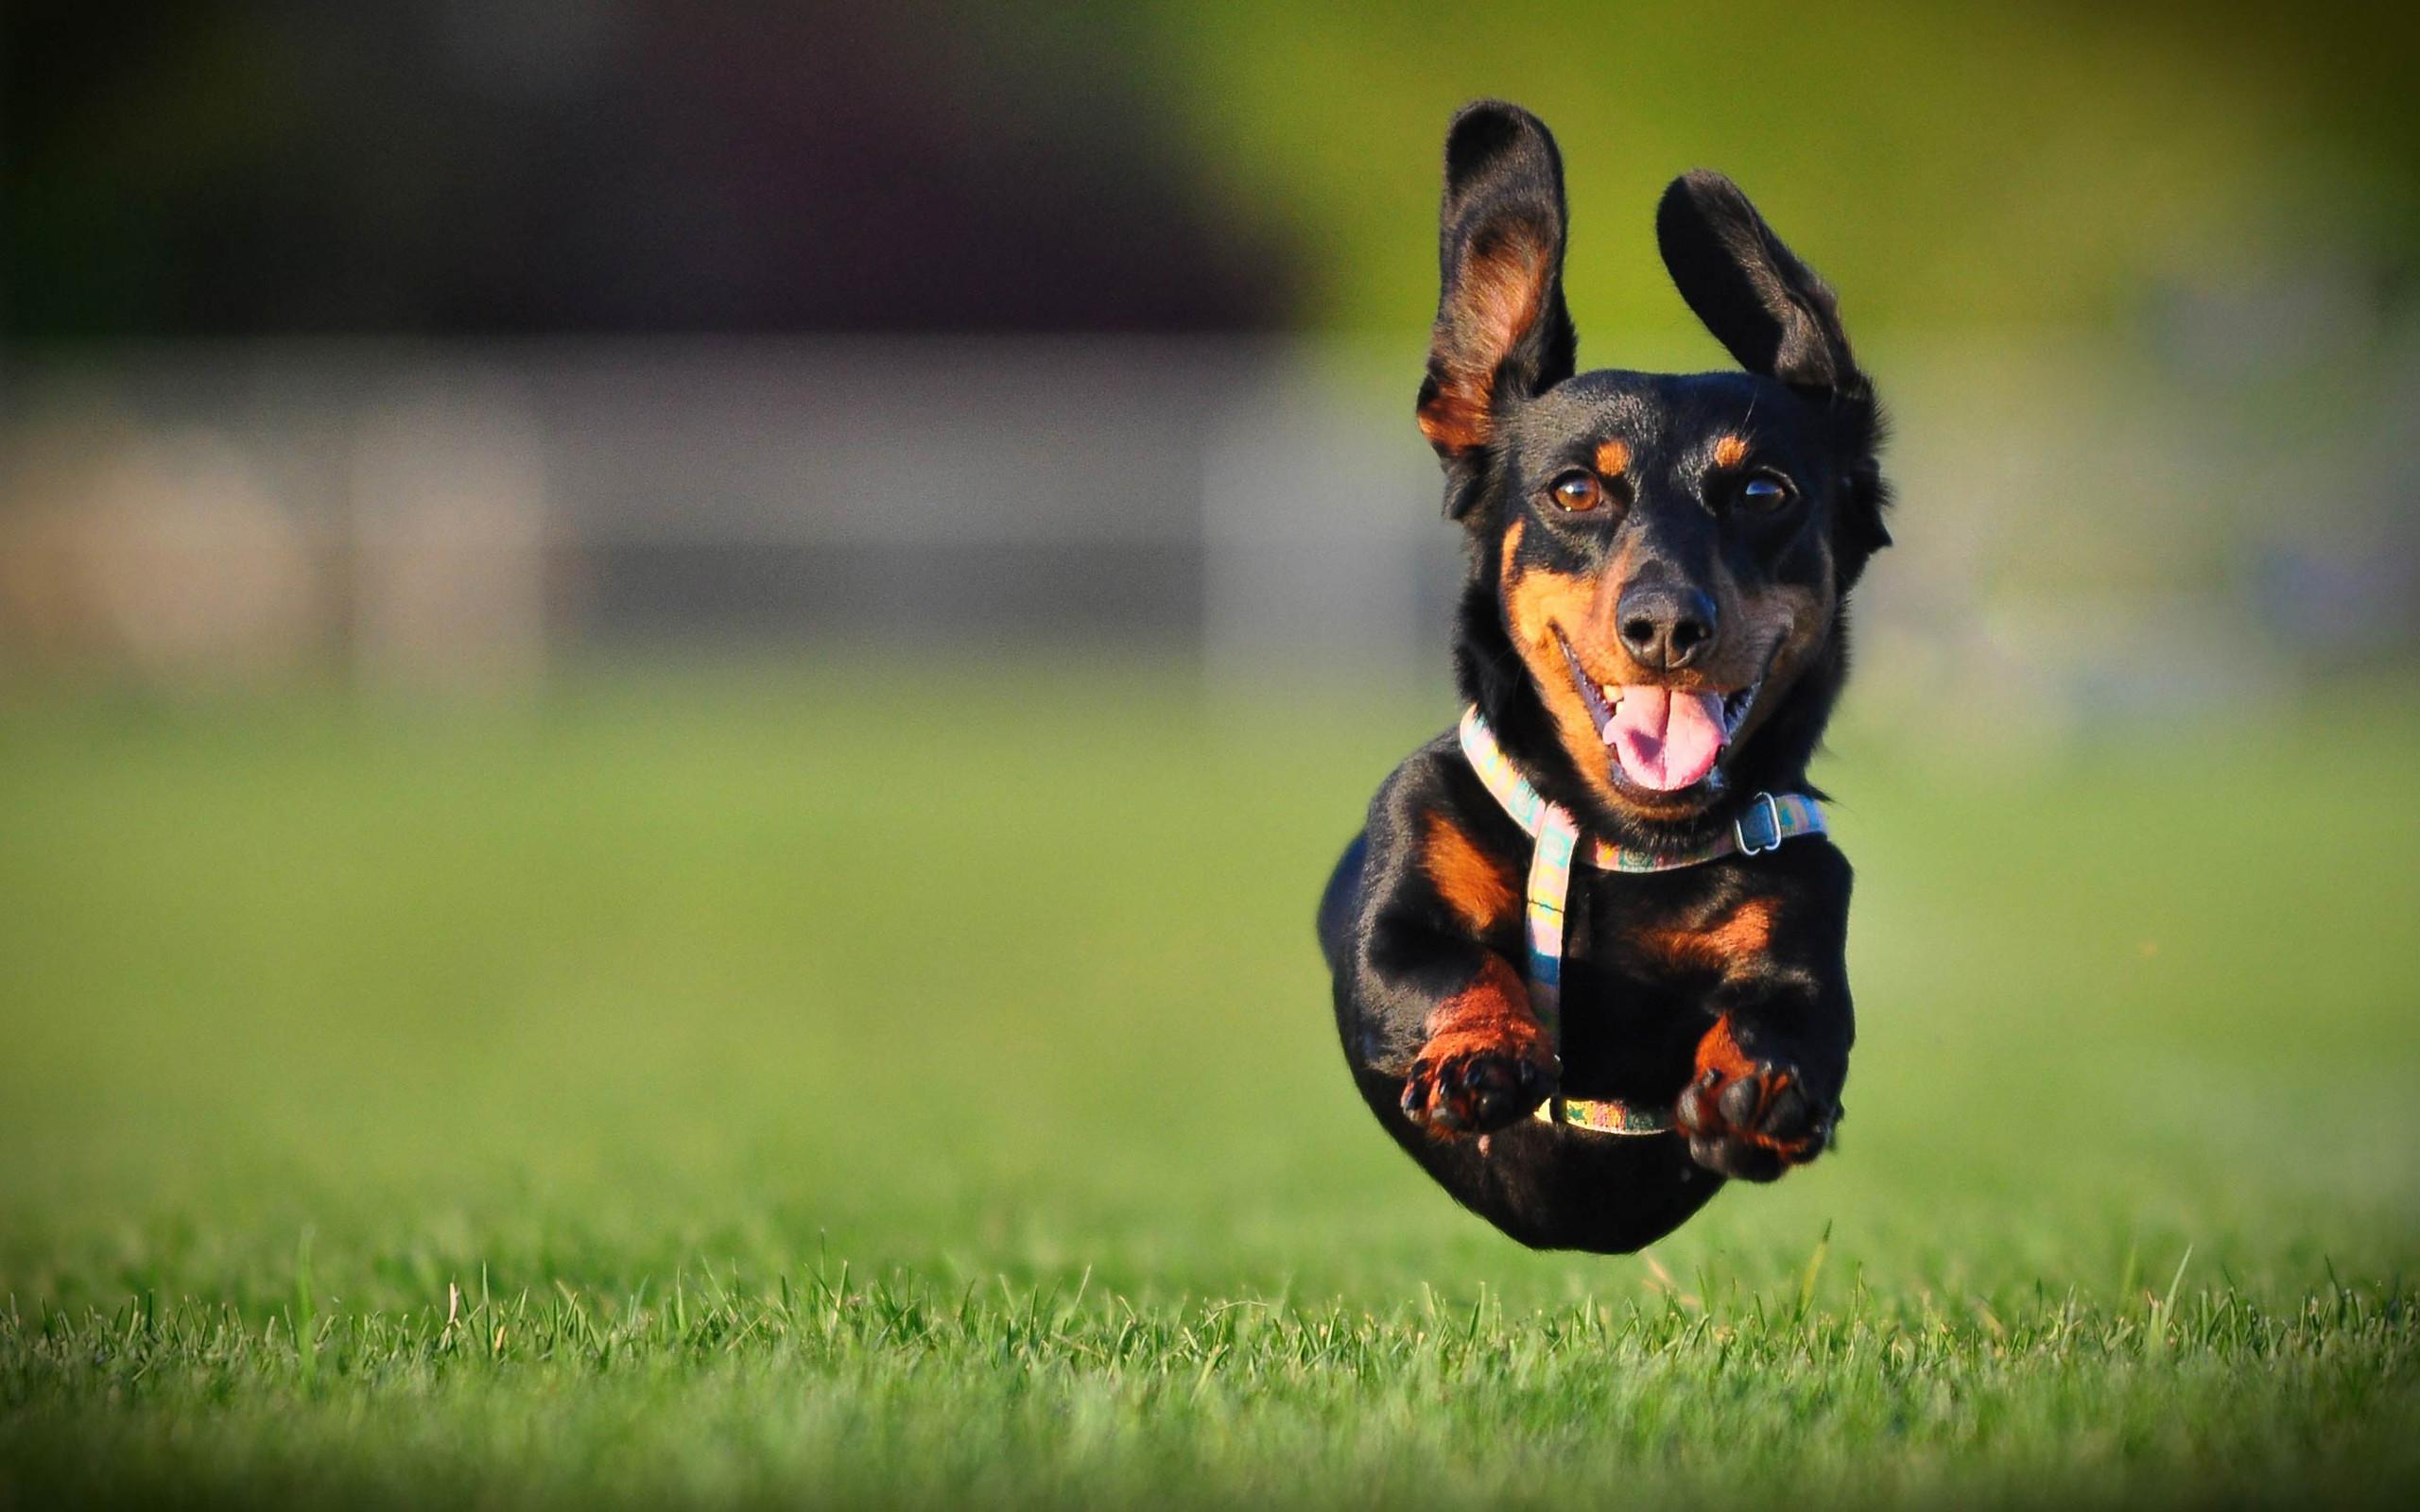 Weiner Dog Wallpaper 58 images 2560x1600